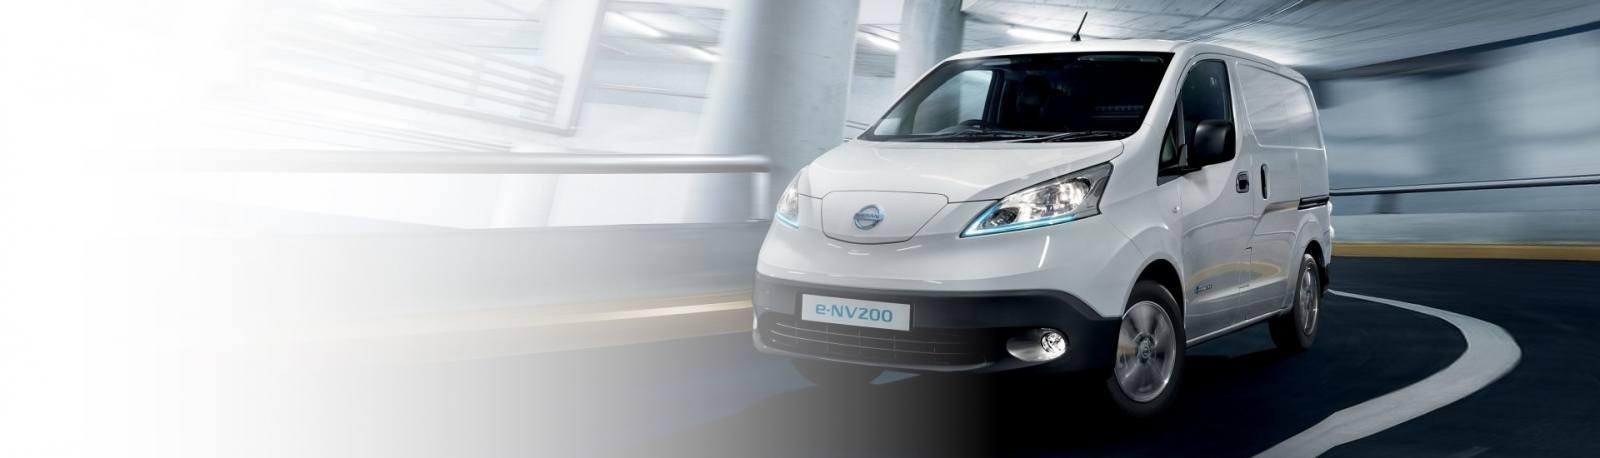 Nissan e-NV200 electric van for V2G Vehicle-to-Grid